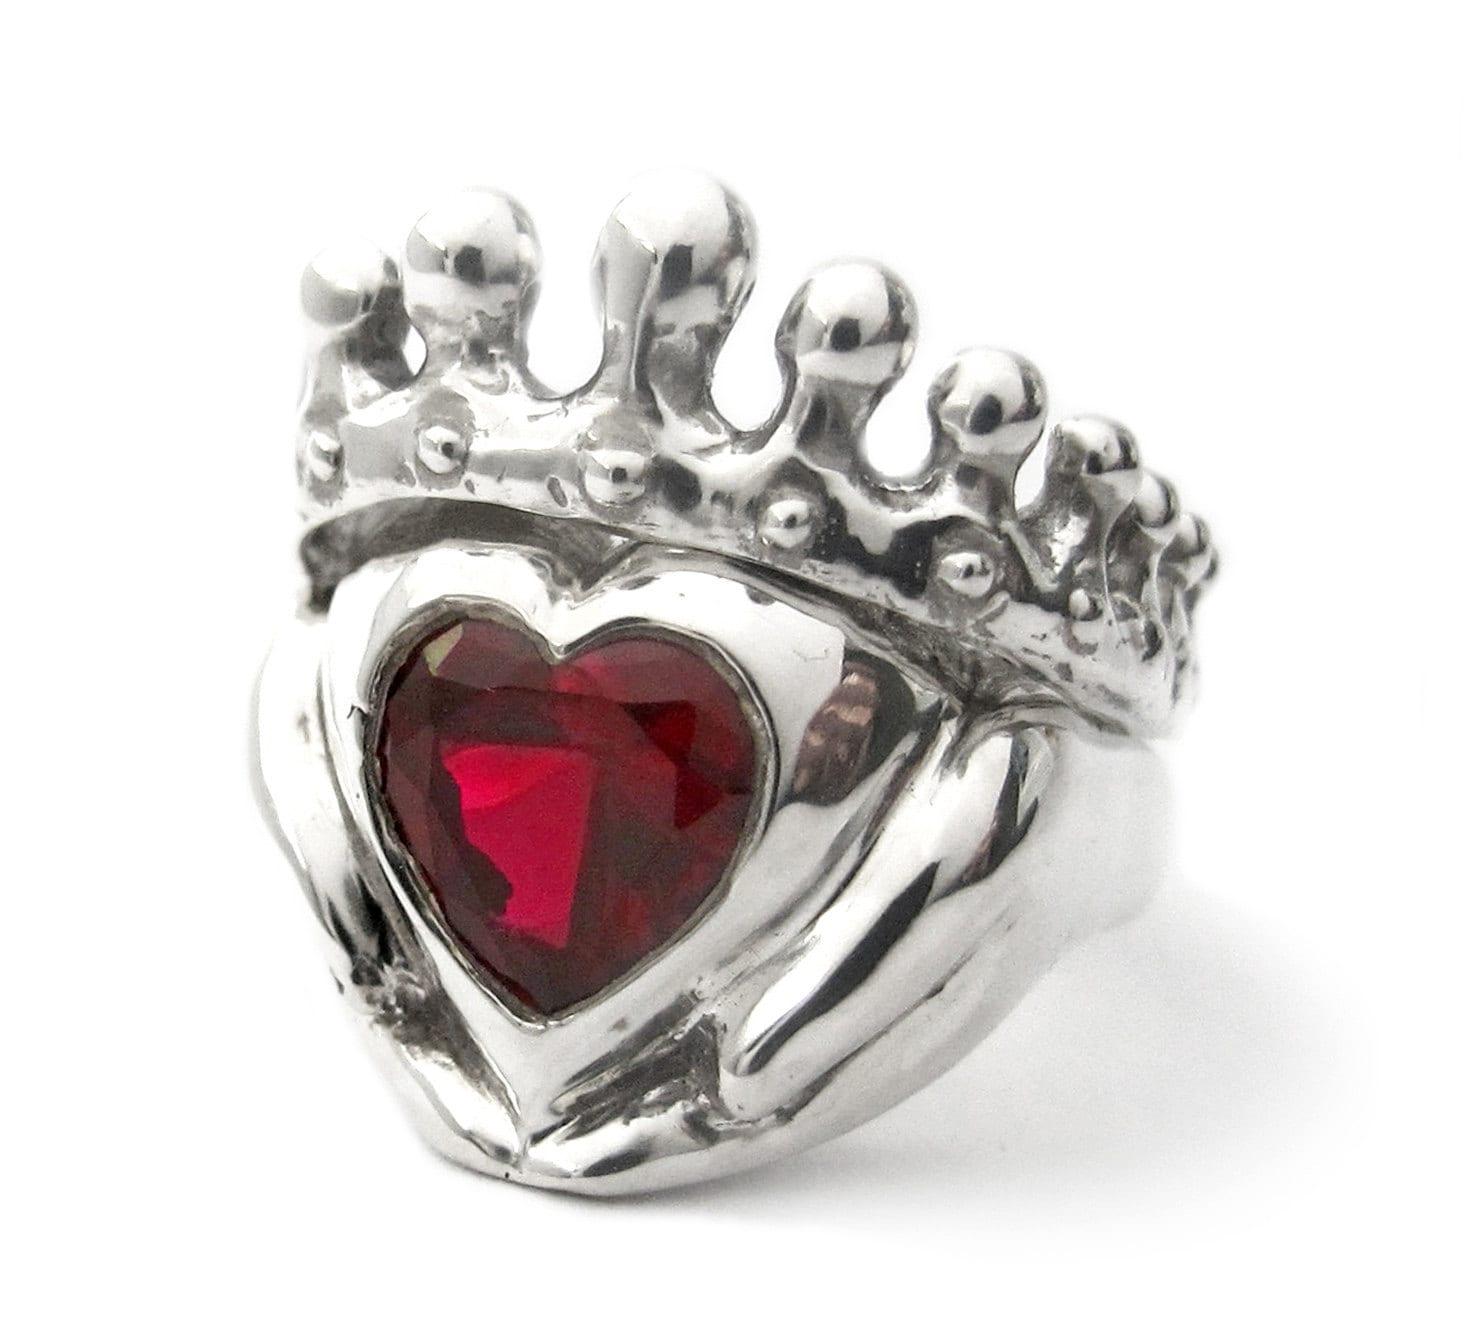 Celtic Engagement Rings Canada irish wedding rings Big Red Heart Claddagh Wedding Set Engagement and wedding ring Celtic